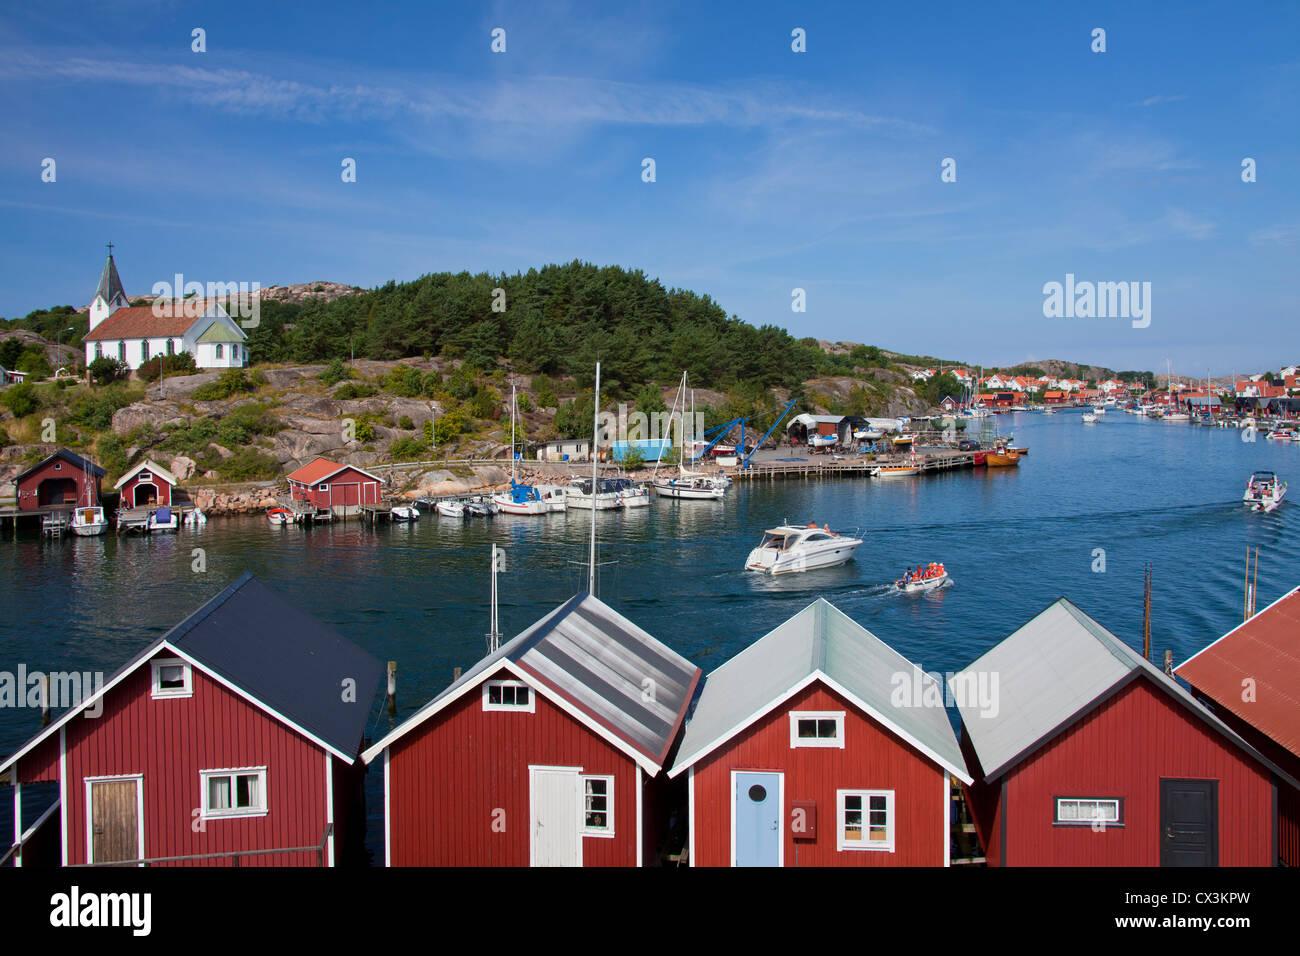 Red wooden boat huts in the harbour at Hamburgsund, Bohuslän, Sweden Stock Photo